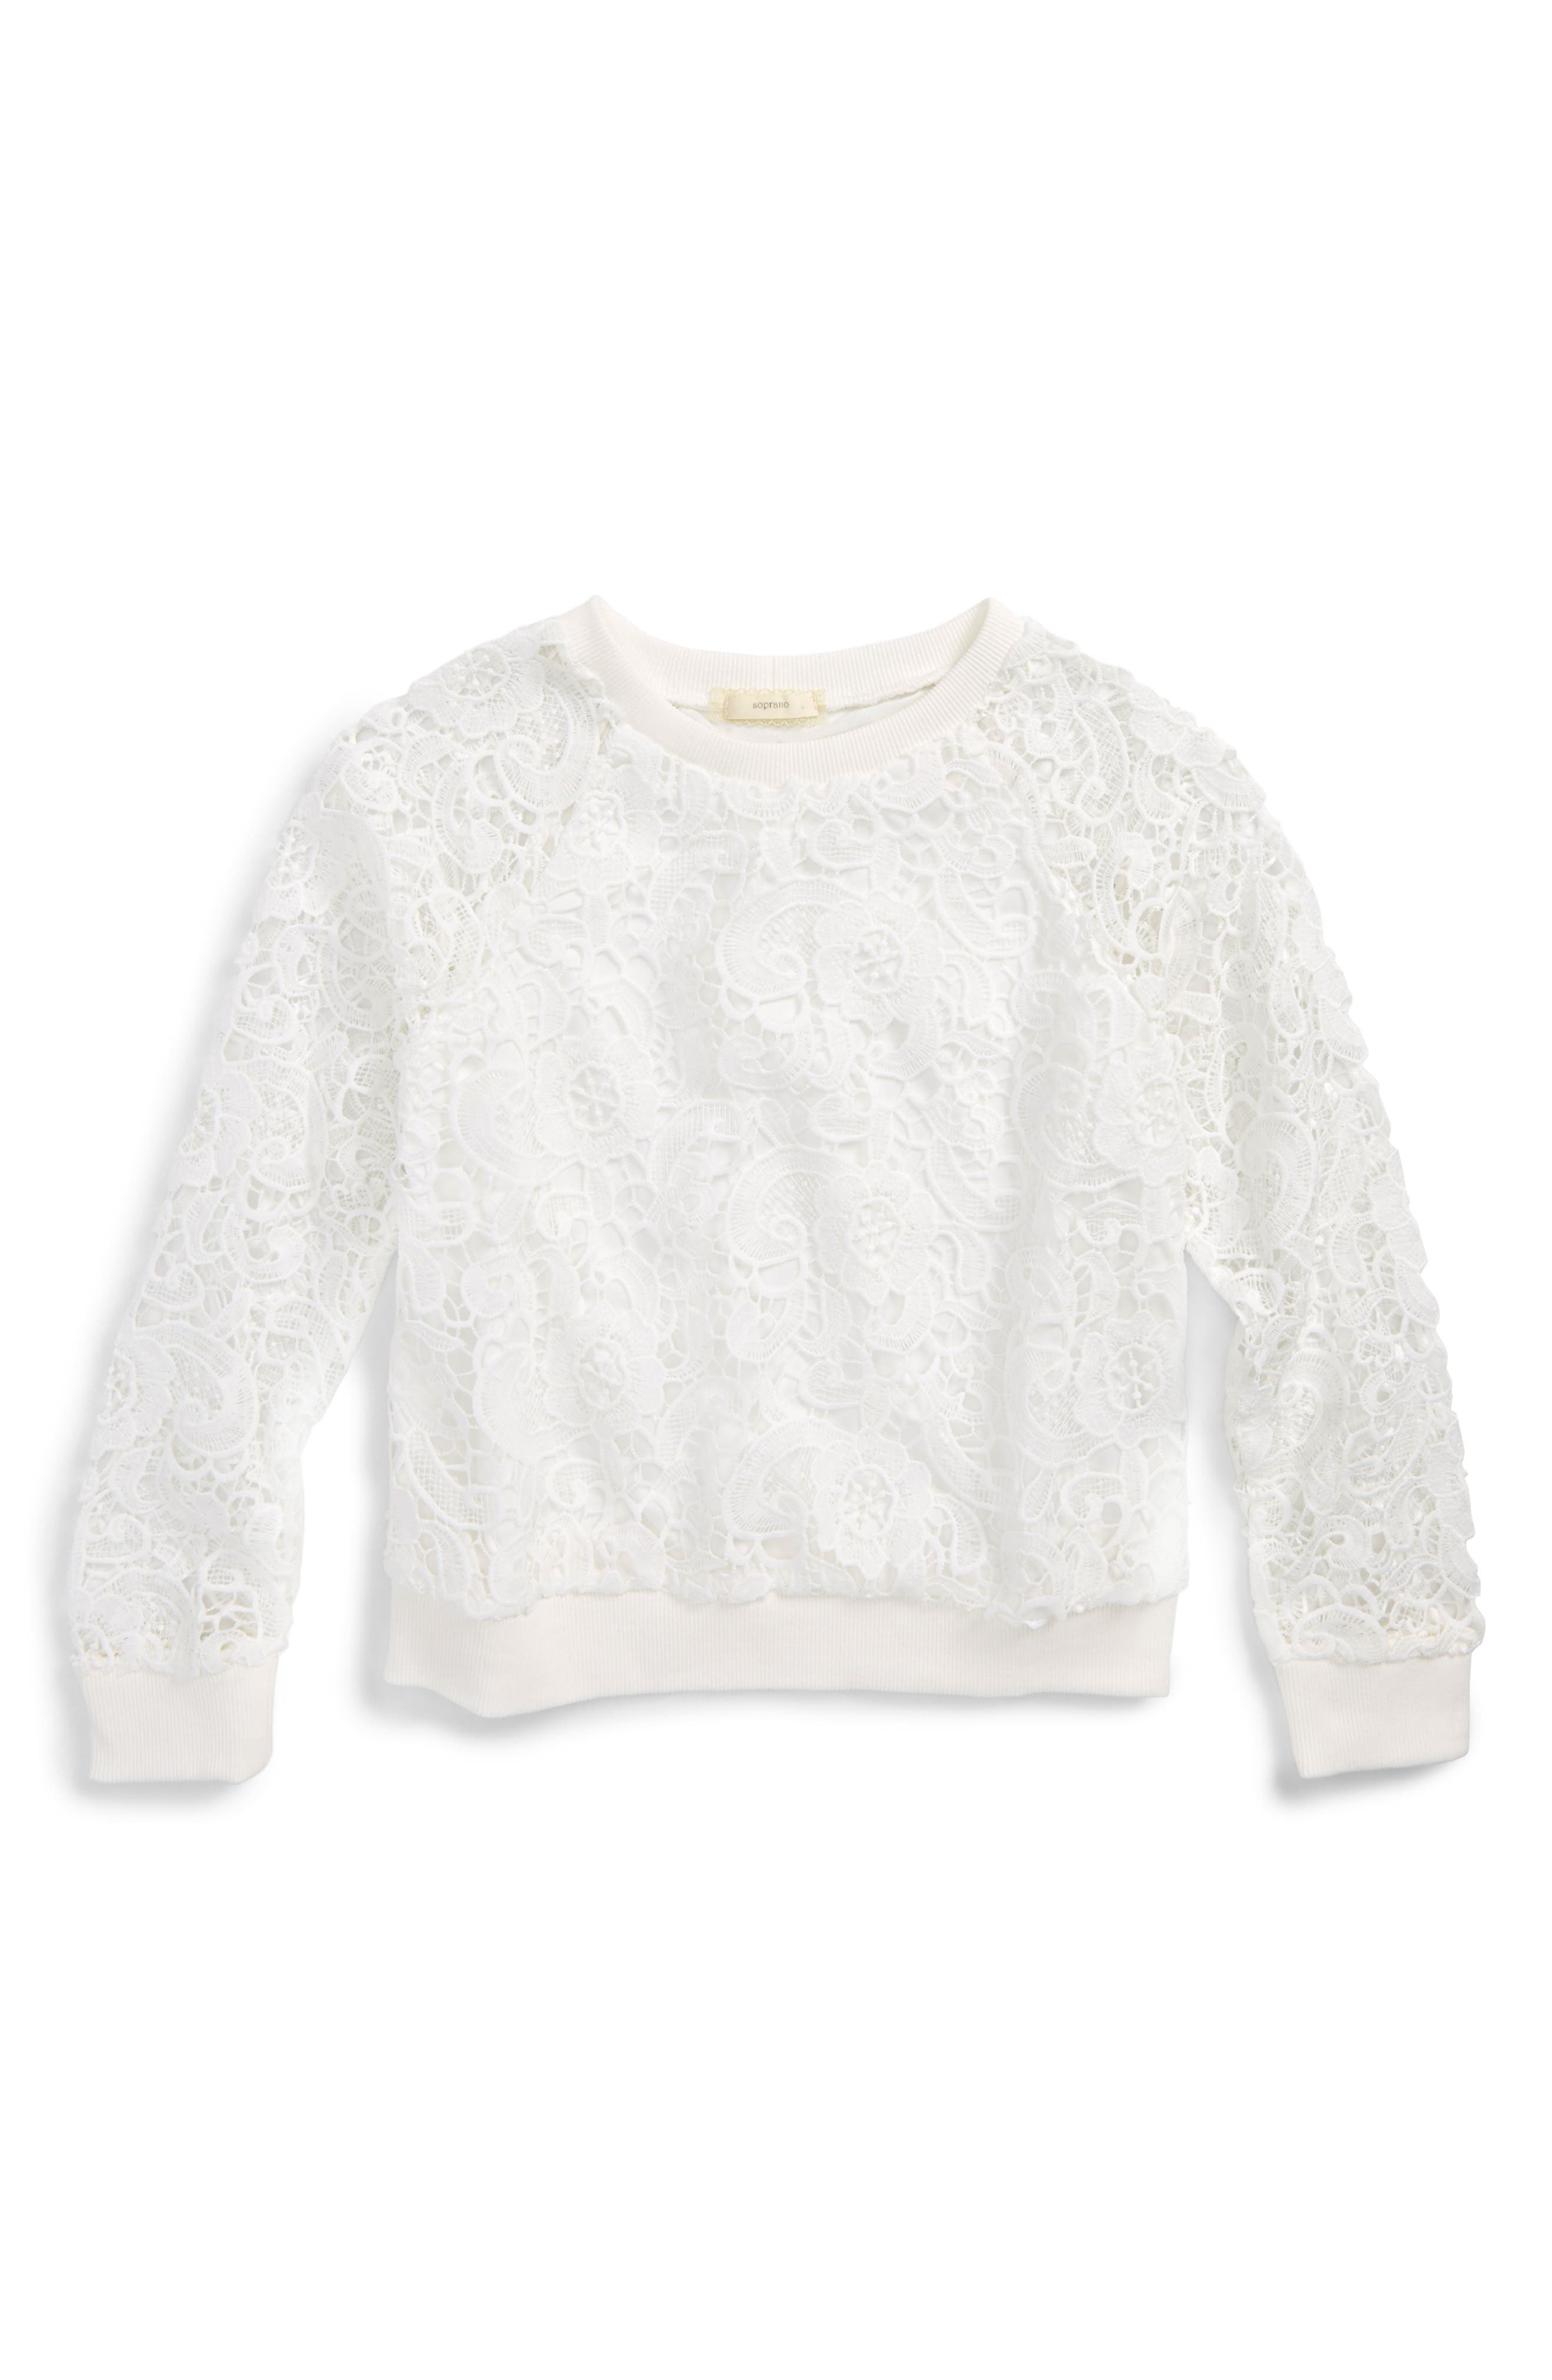 Lace Overlay Sweatshirt,                         Main,                         color, 106